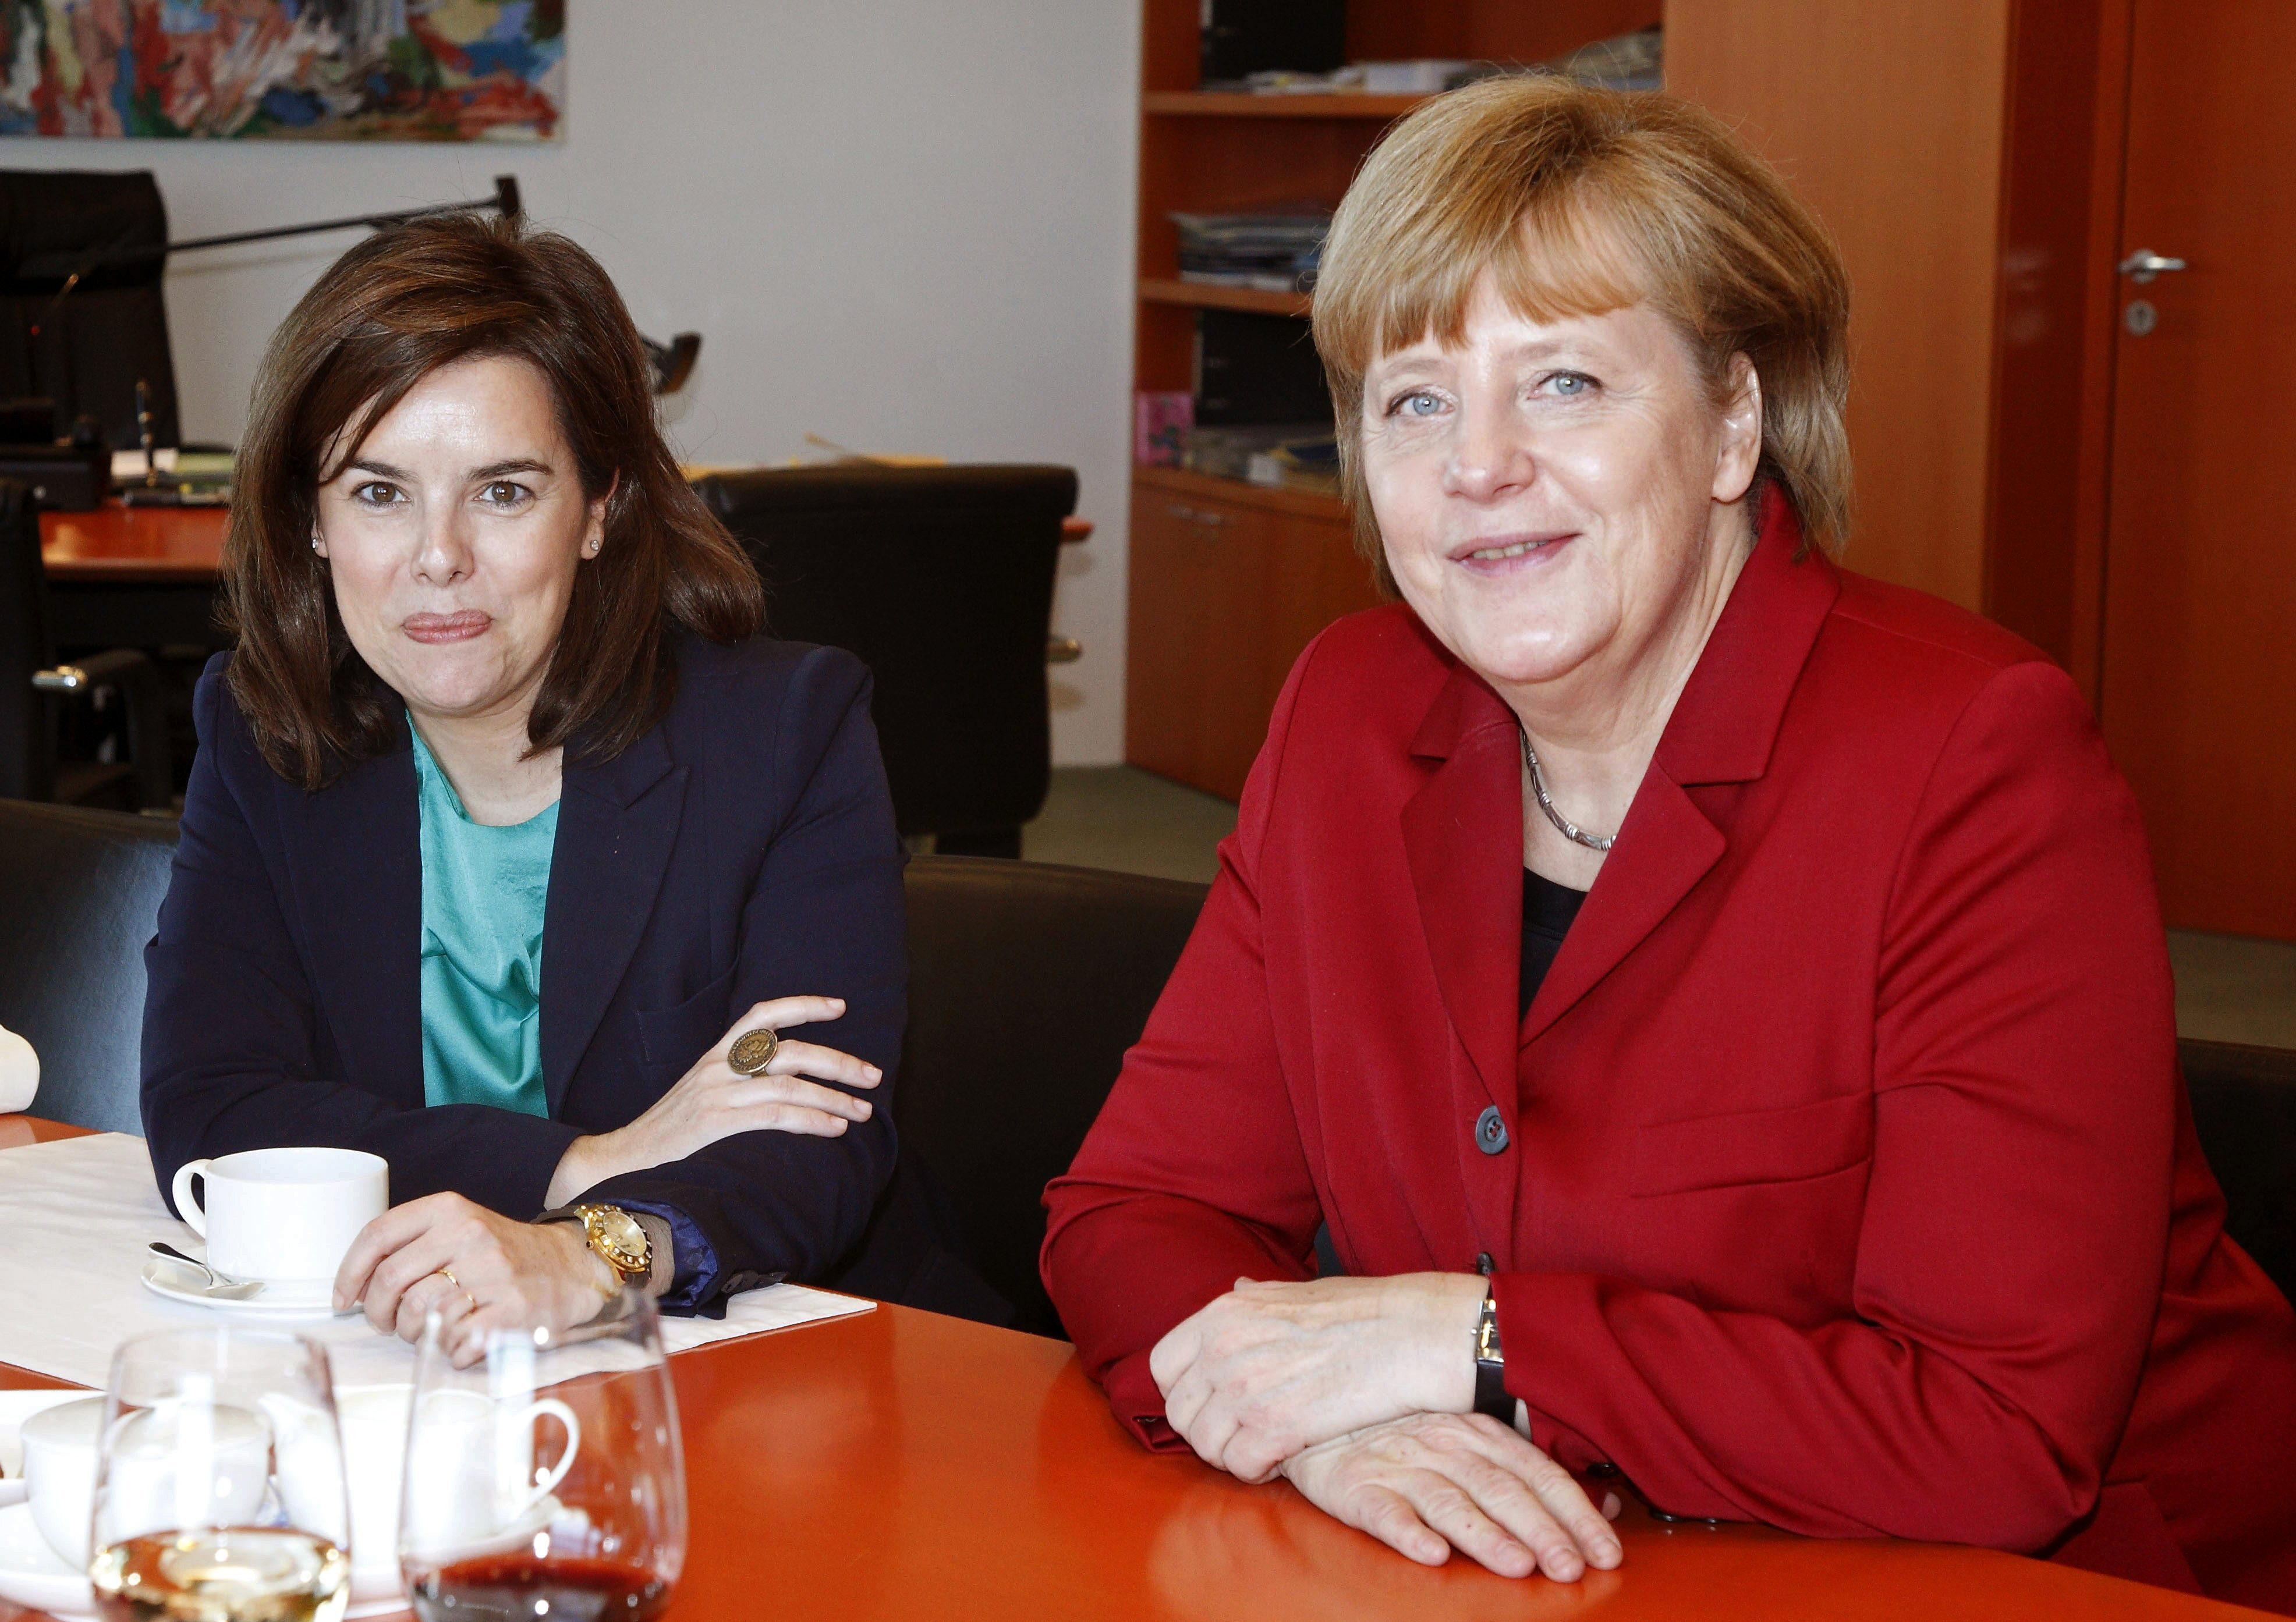 Soraya Sáenz reinará mañana en la televisión de Berlín